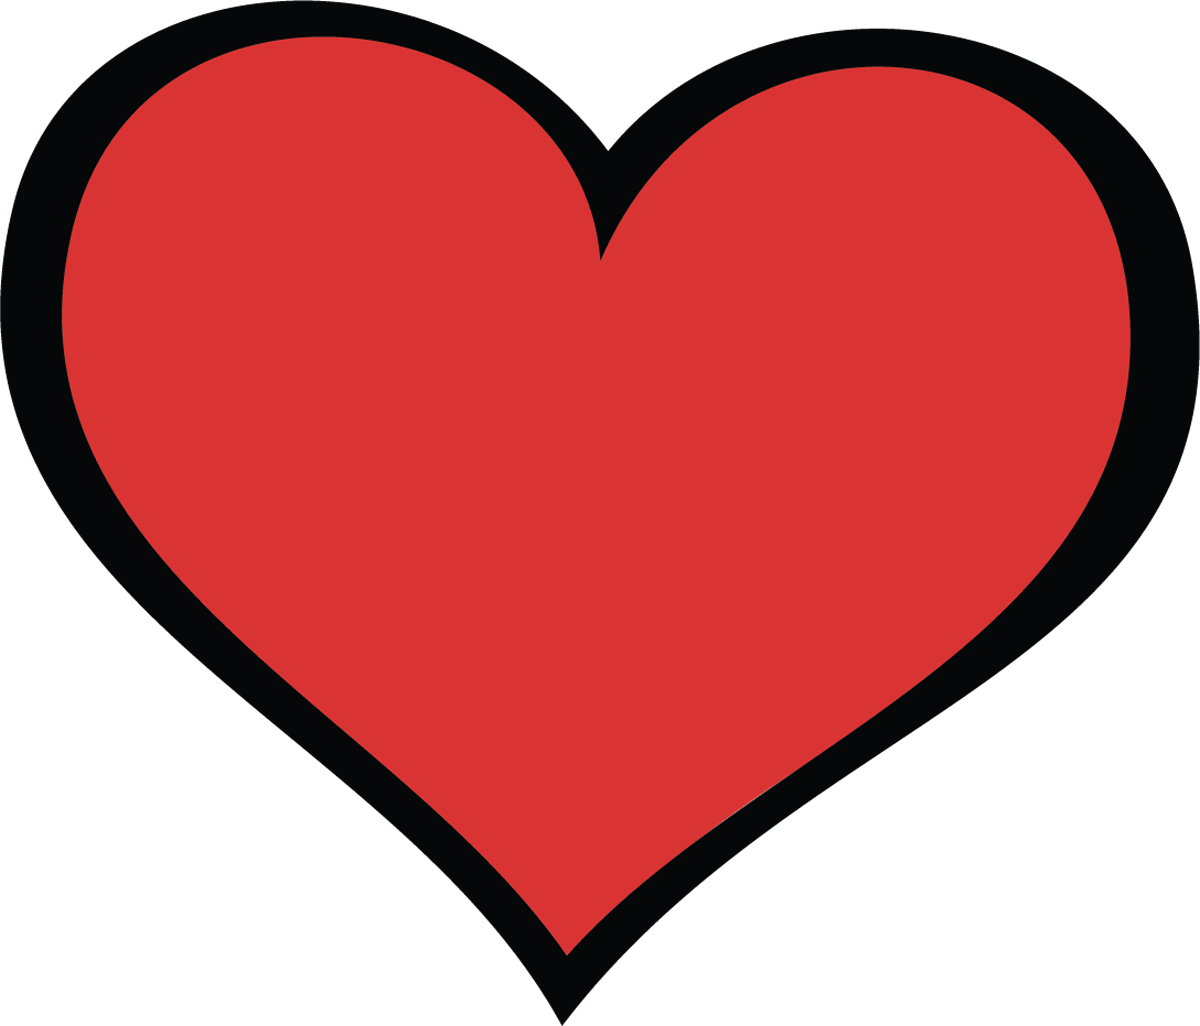 clipart love heart-clipart love heart-0